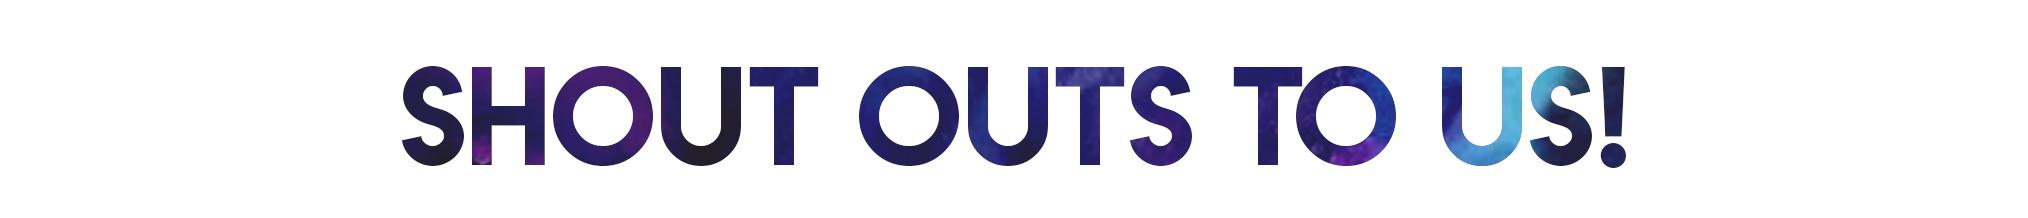 shoutouts2.jpg